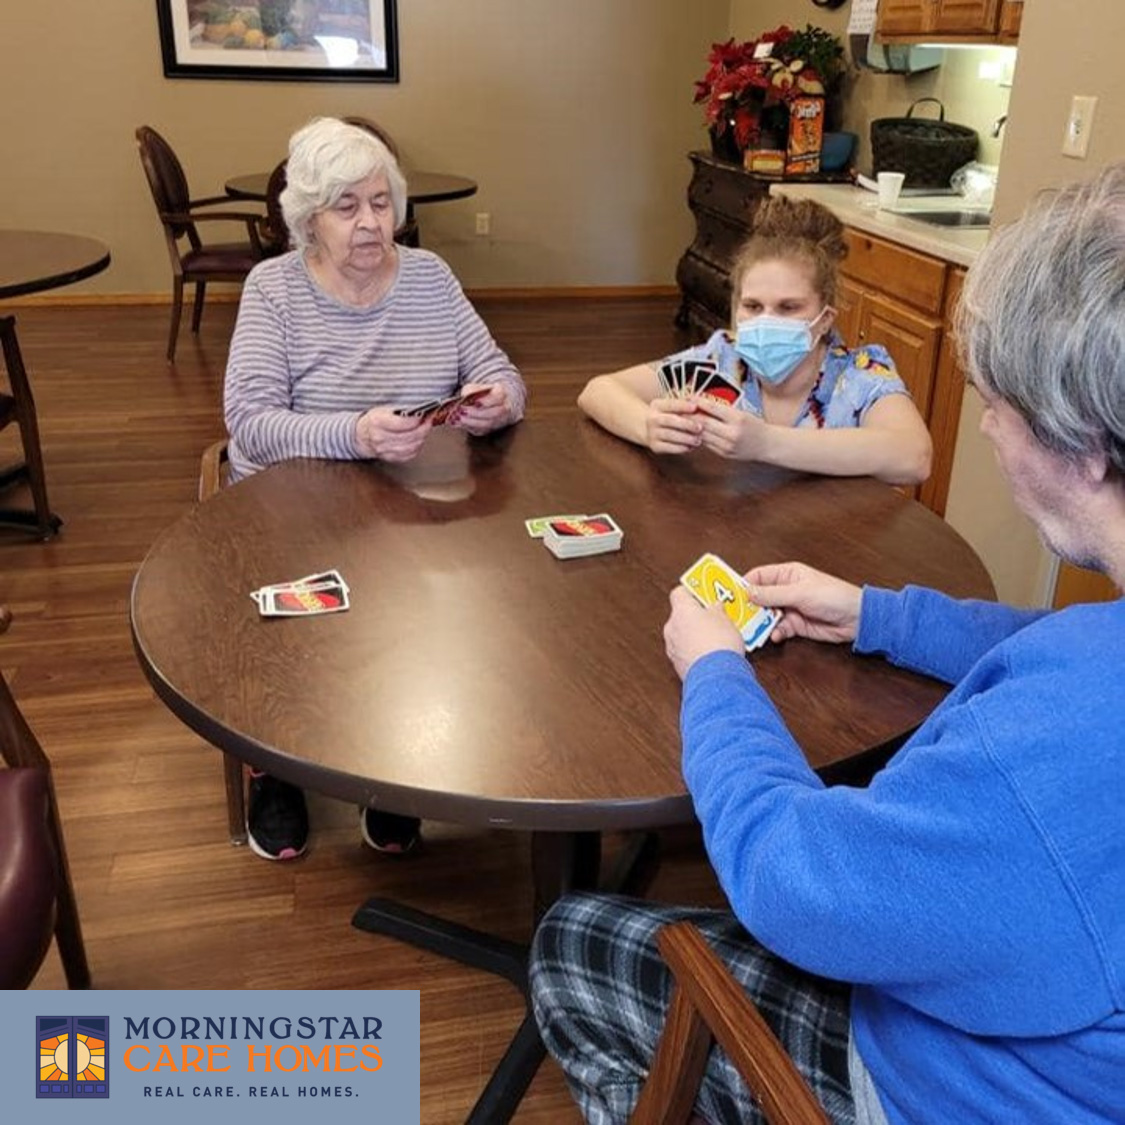 Morningstar-Care-Homes-square-003